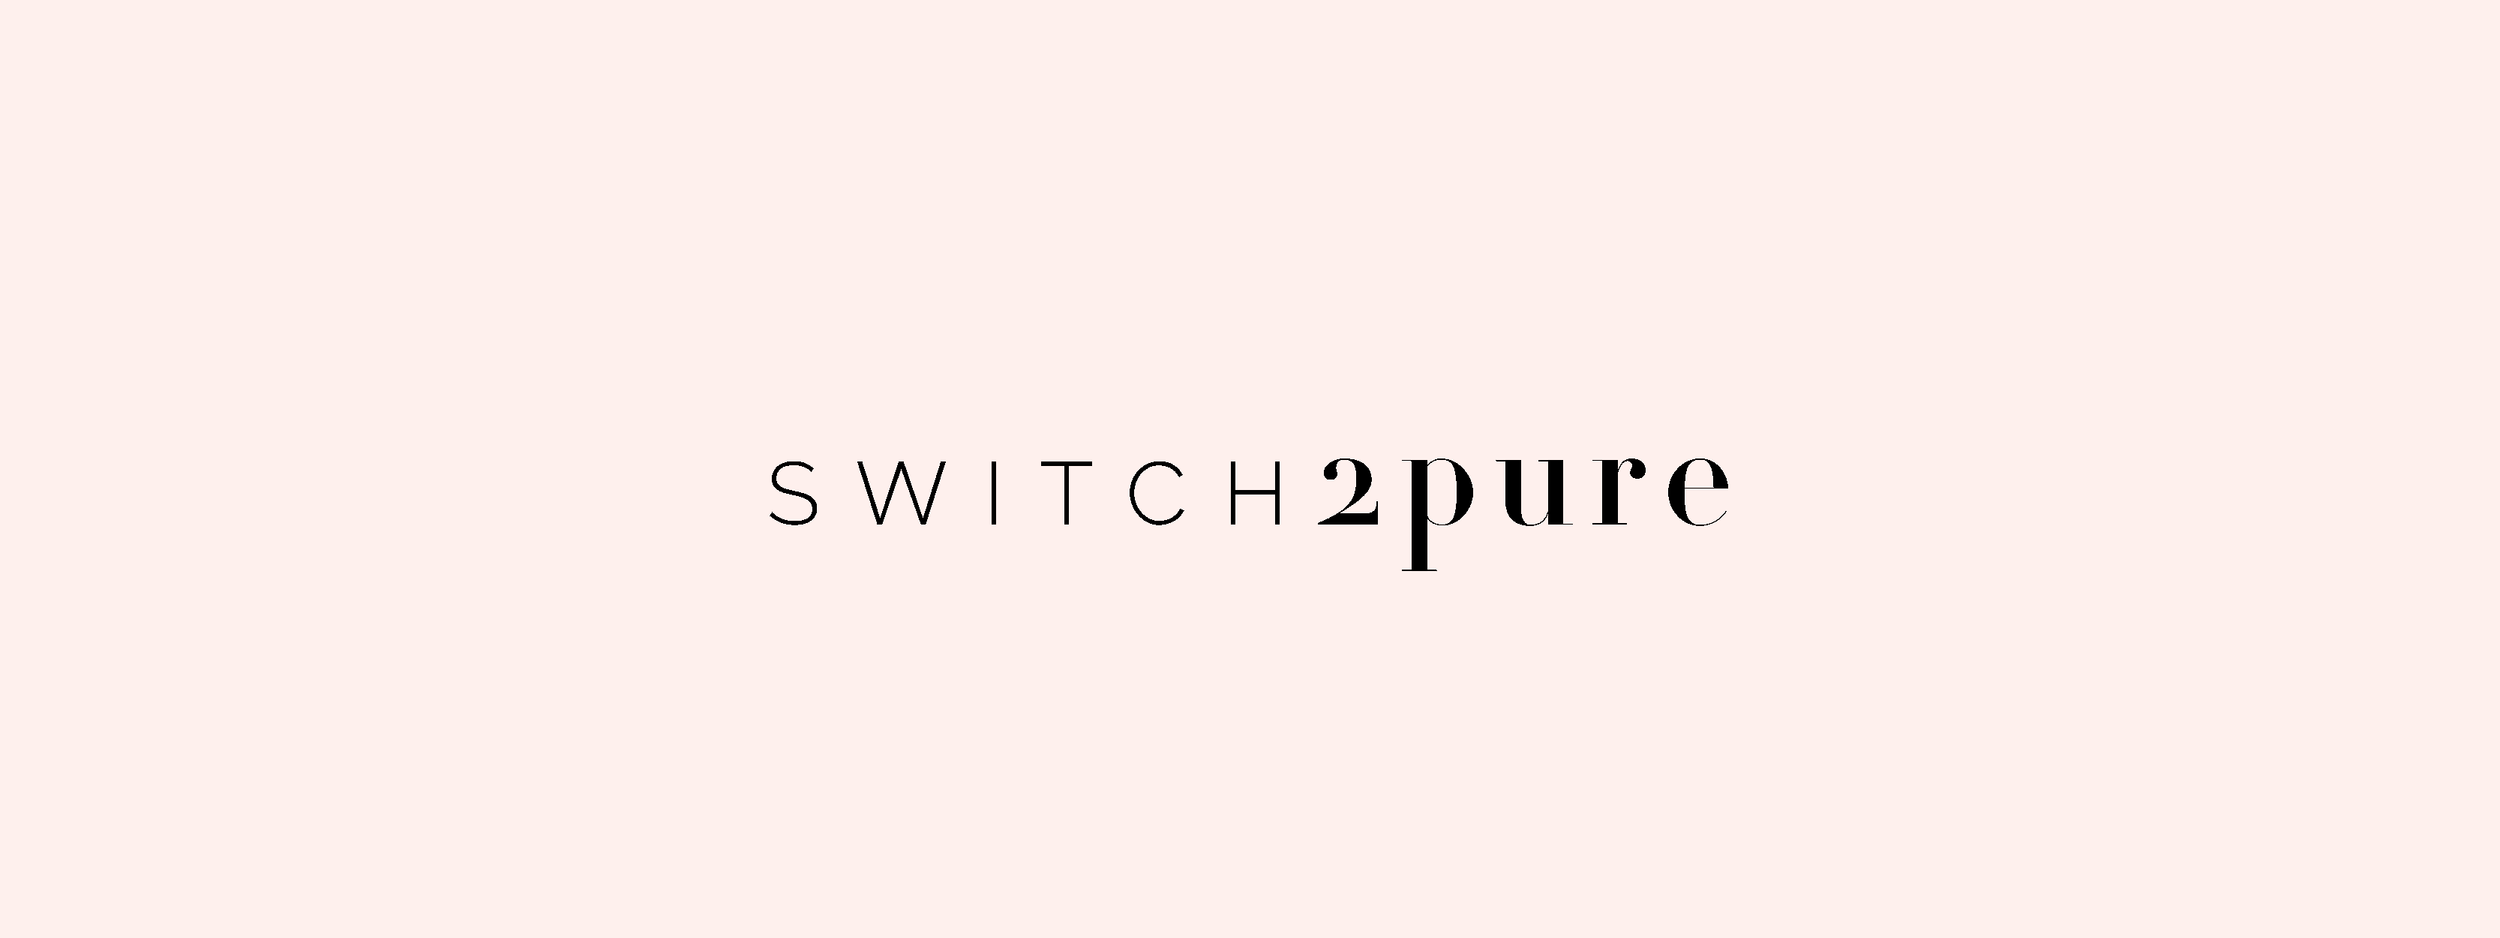 switch2pure_branding_logo_logos_nontoxic.png